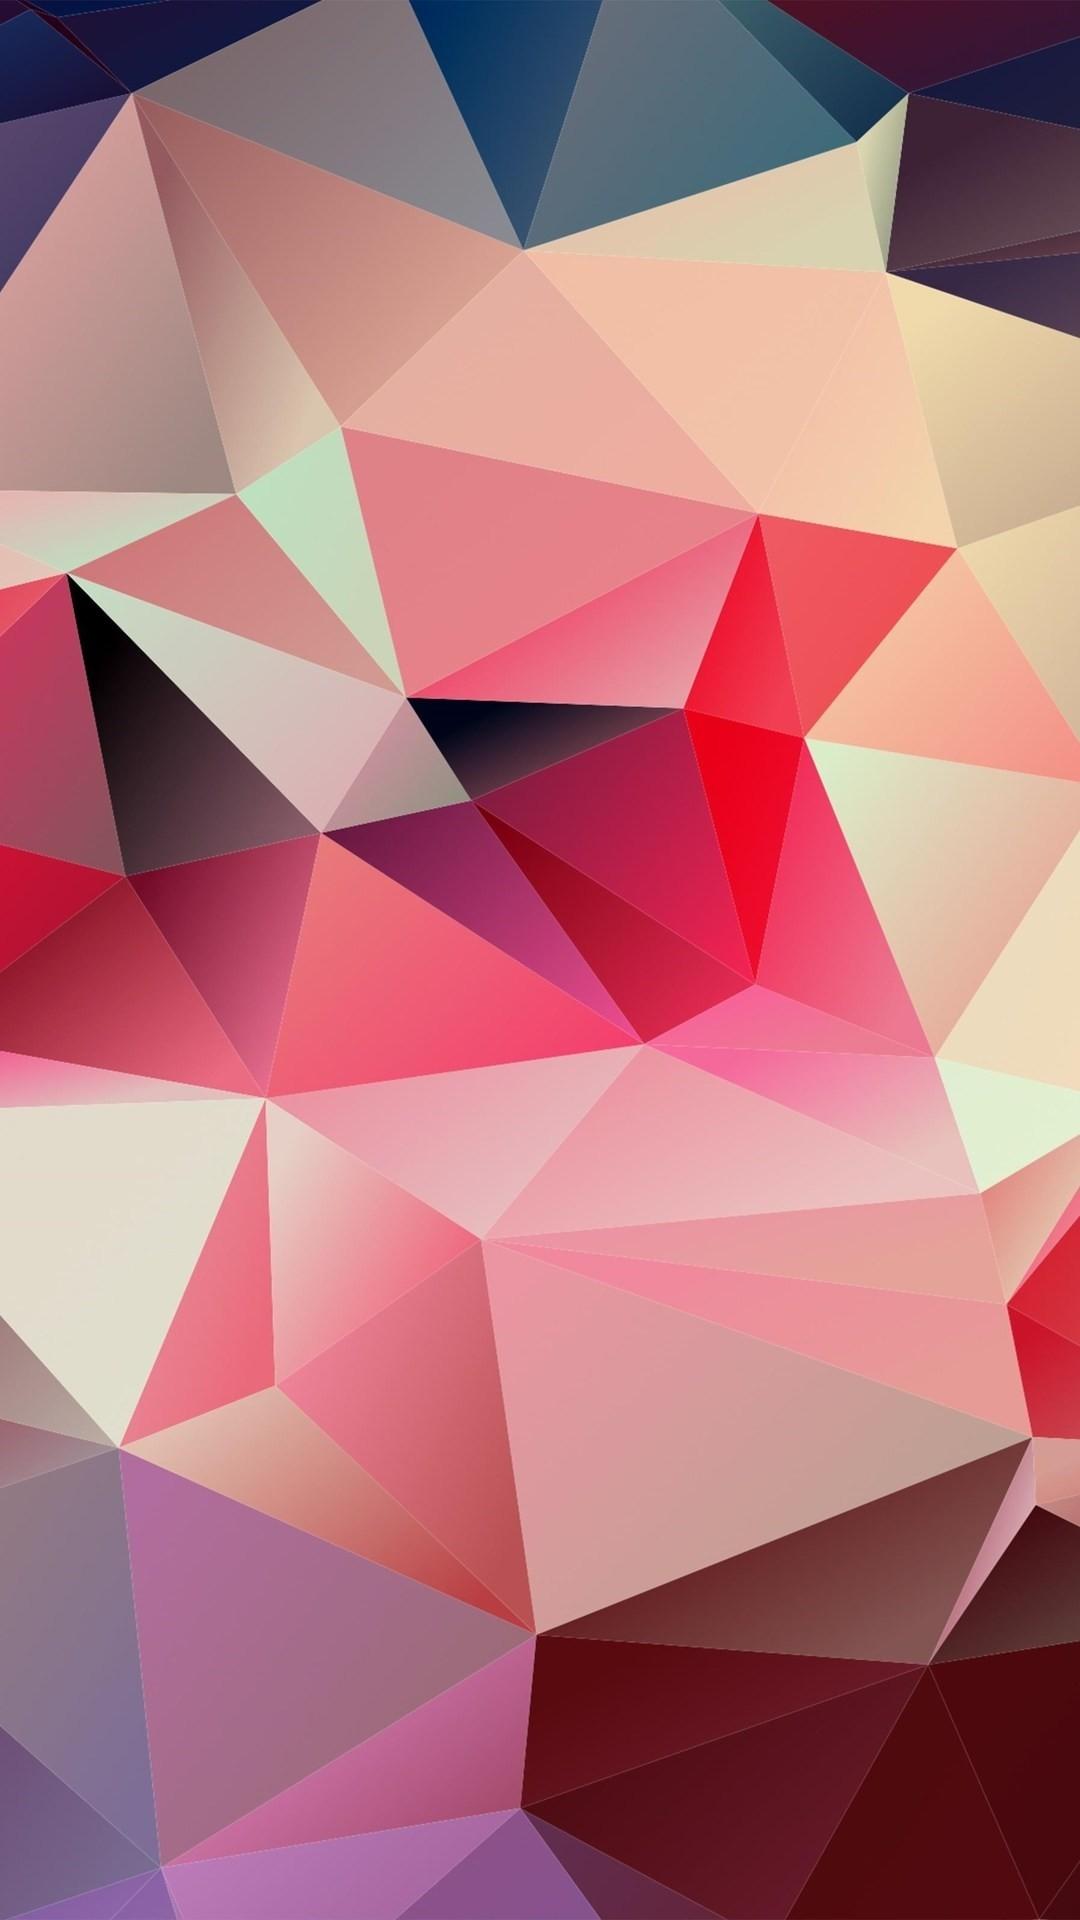 Designer wallpaper for iphone